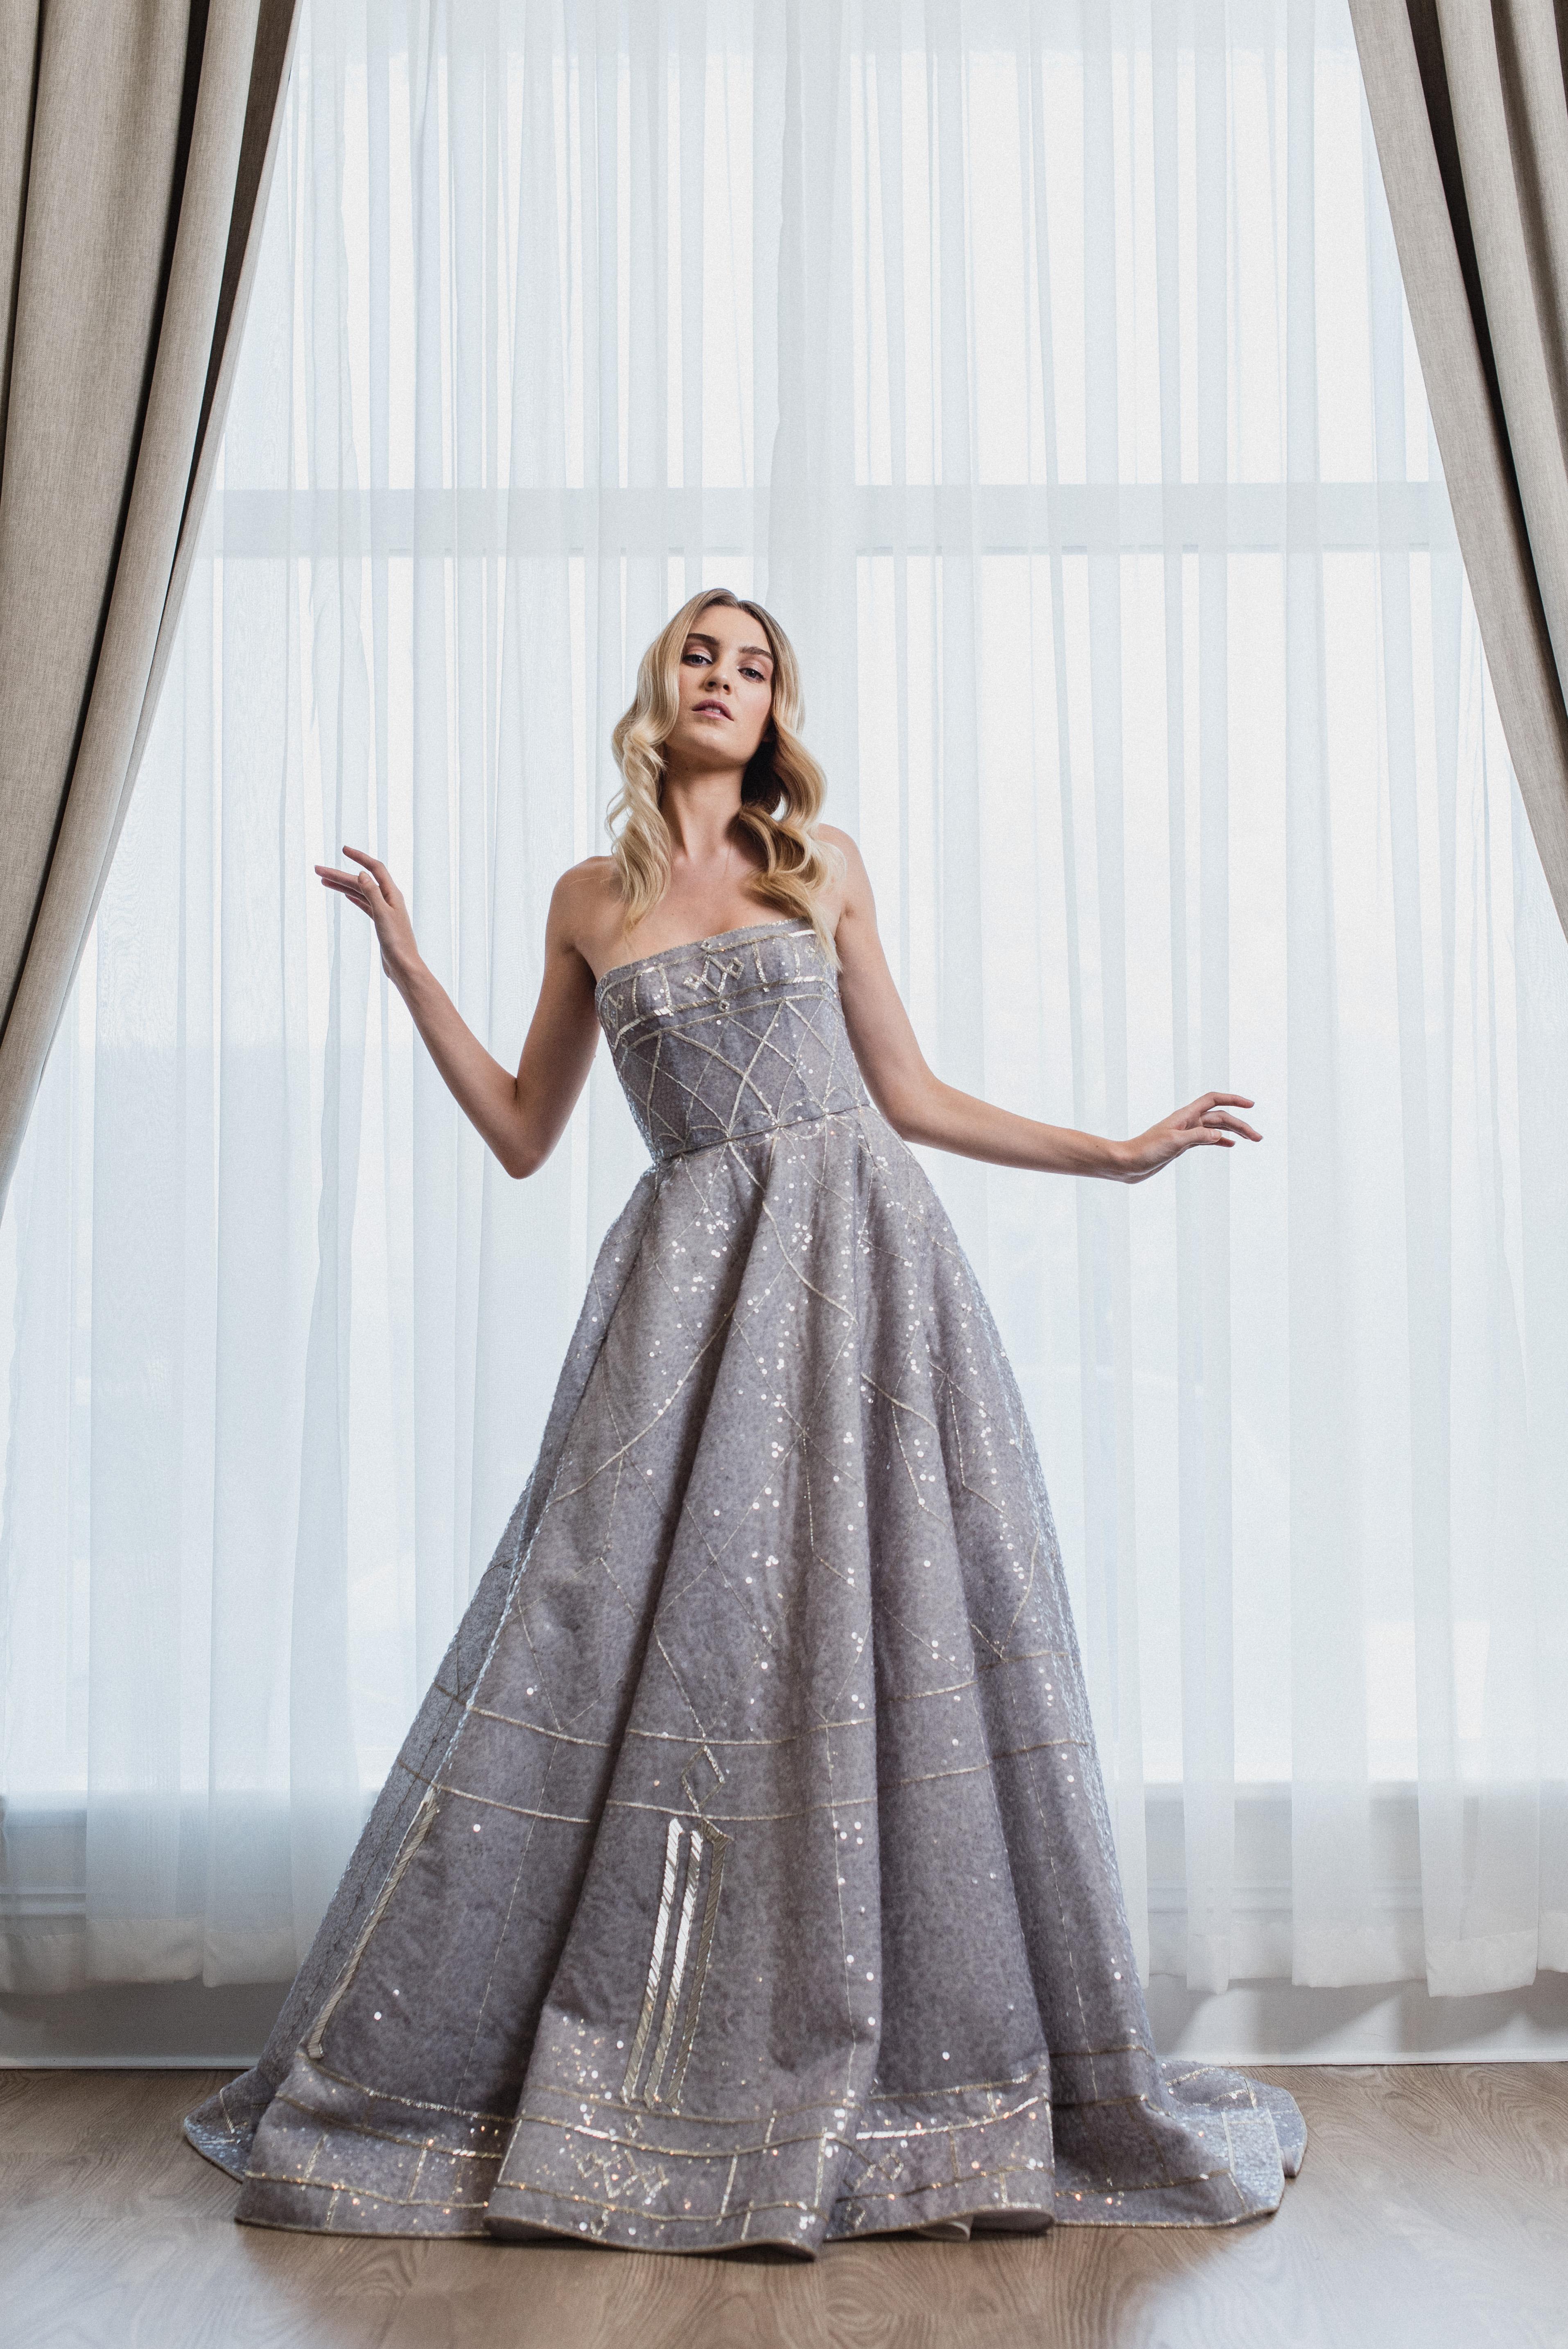 disney 2017 wedding dresses photo - 1